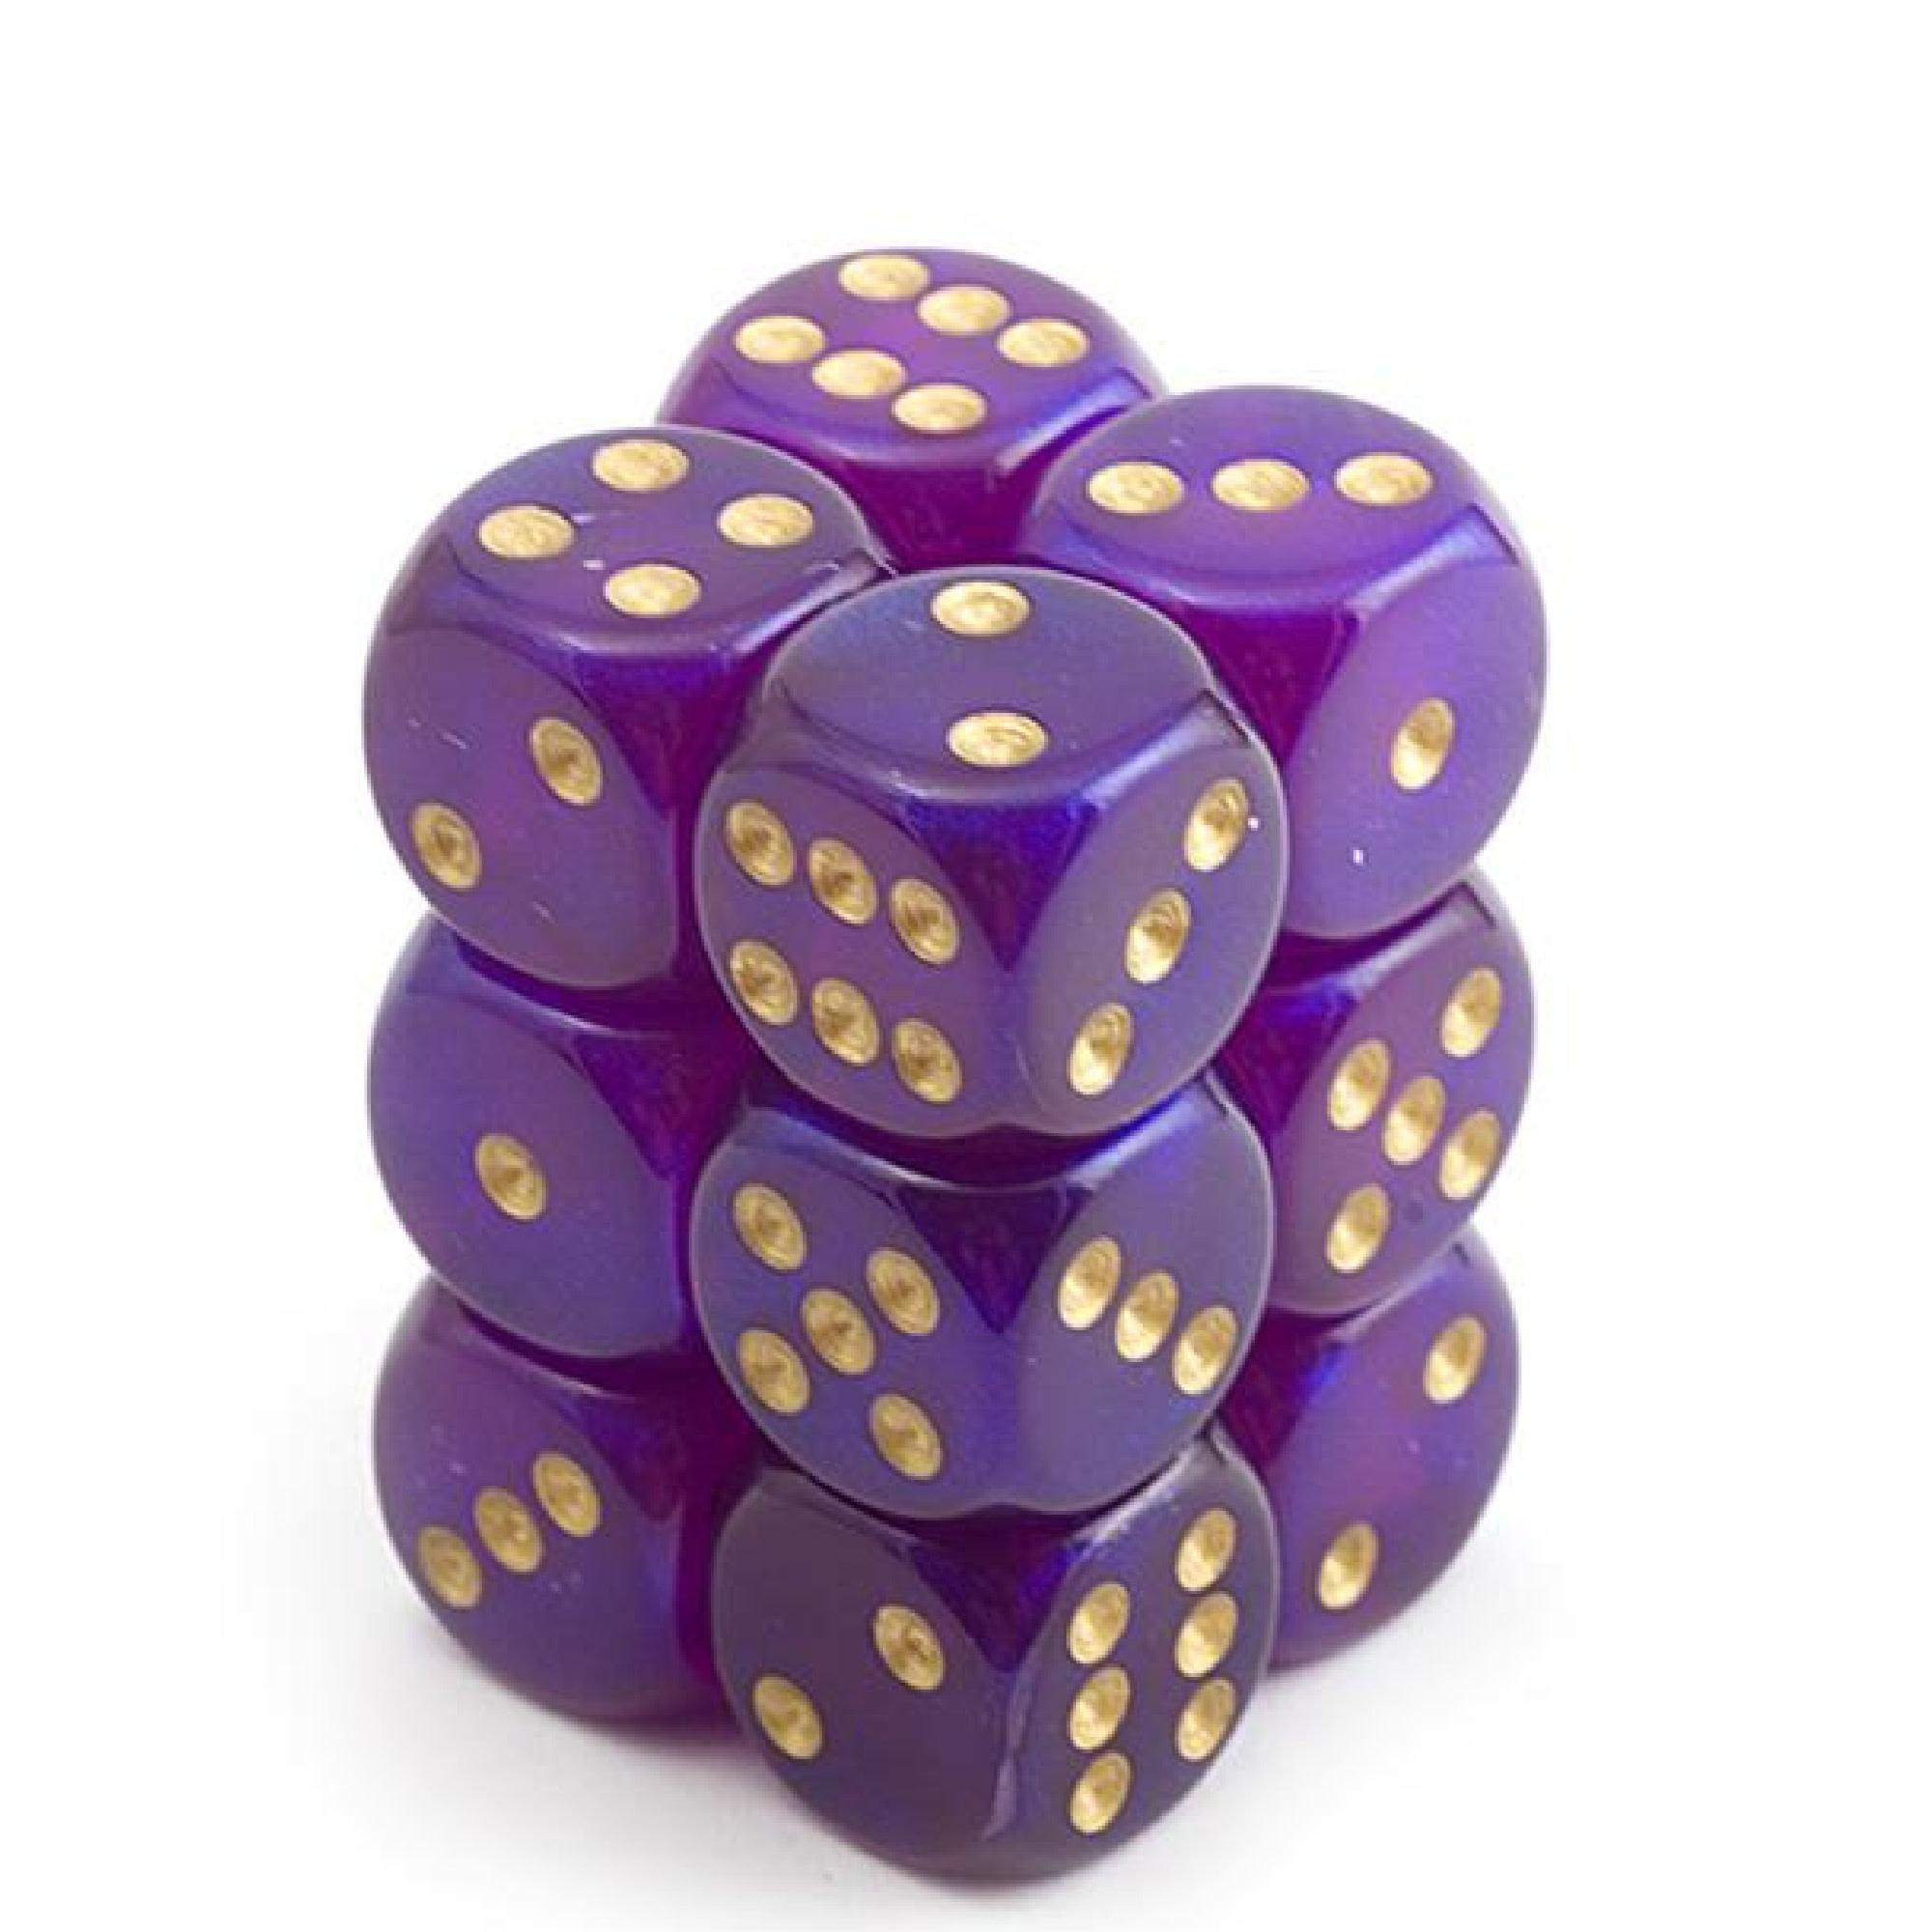 Chessex Borealis: 12D6 Royal Purple/Gold